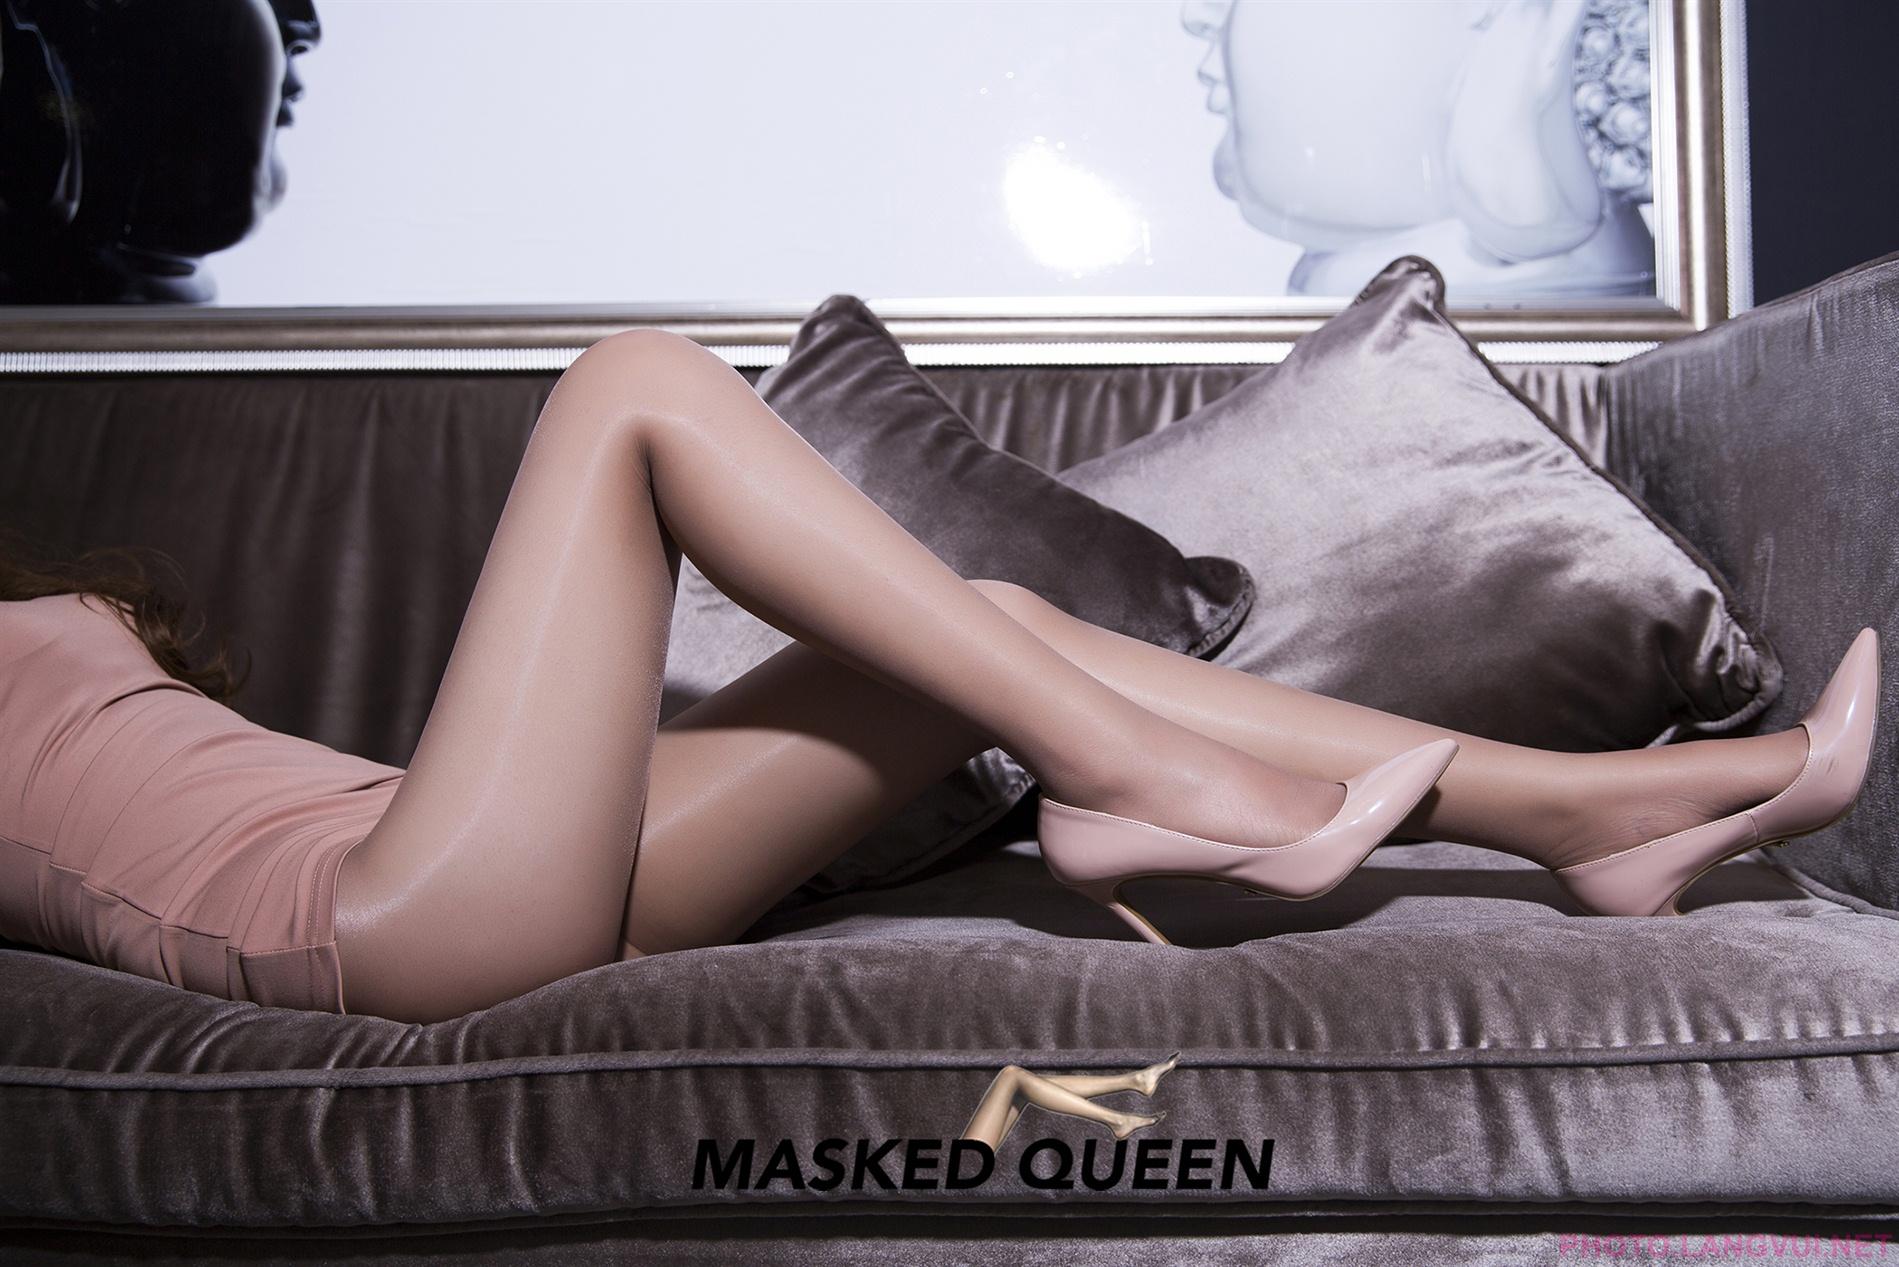 MASKED QUEEN No 003